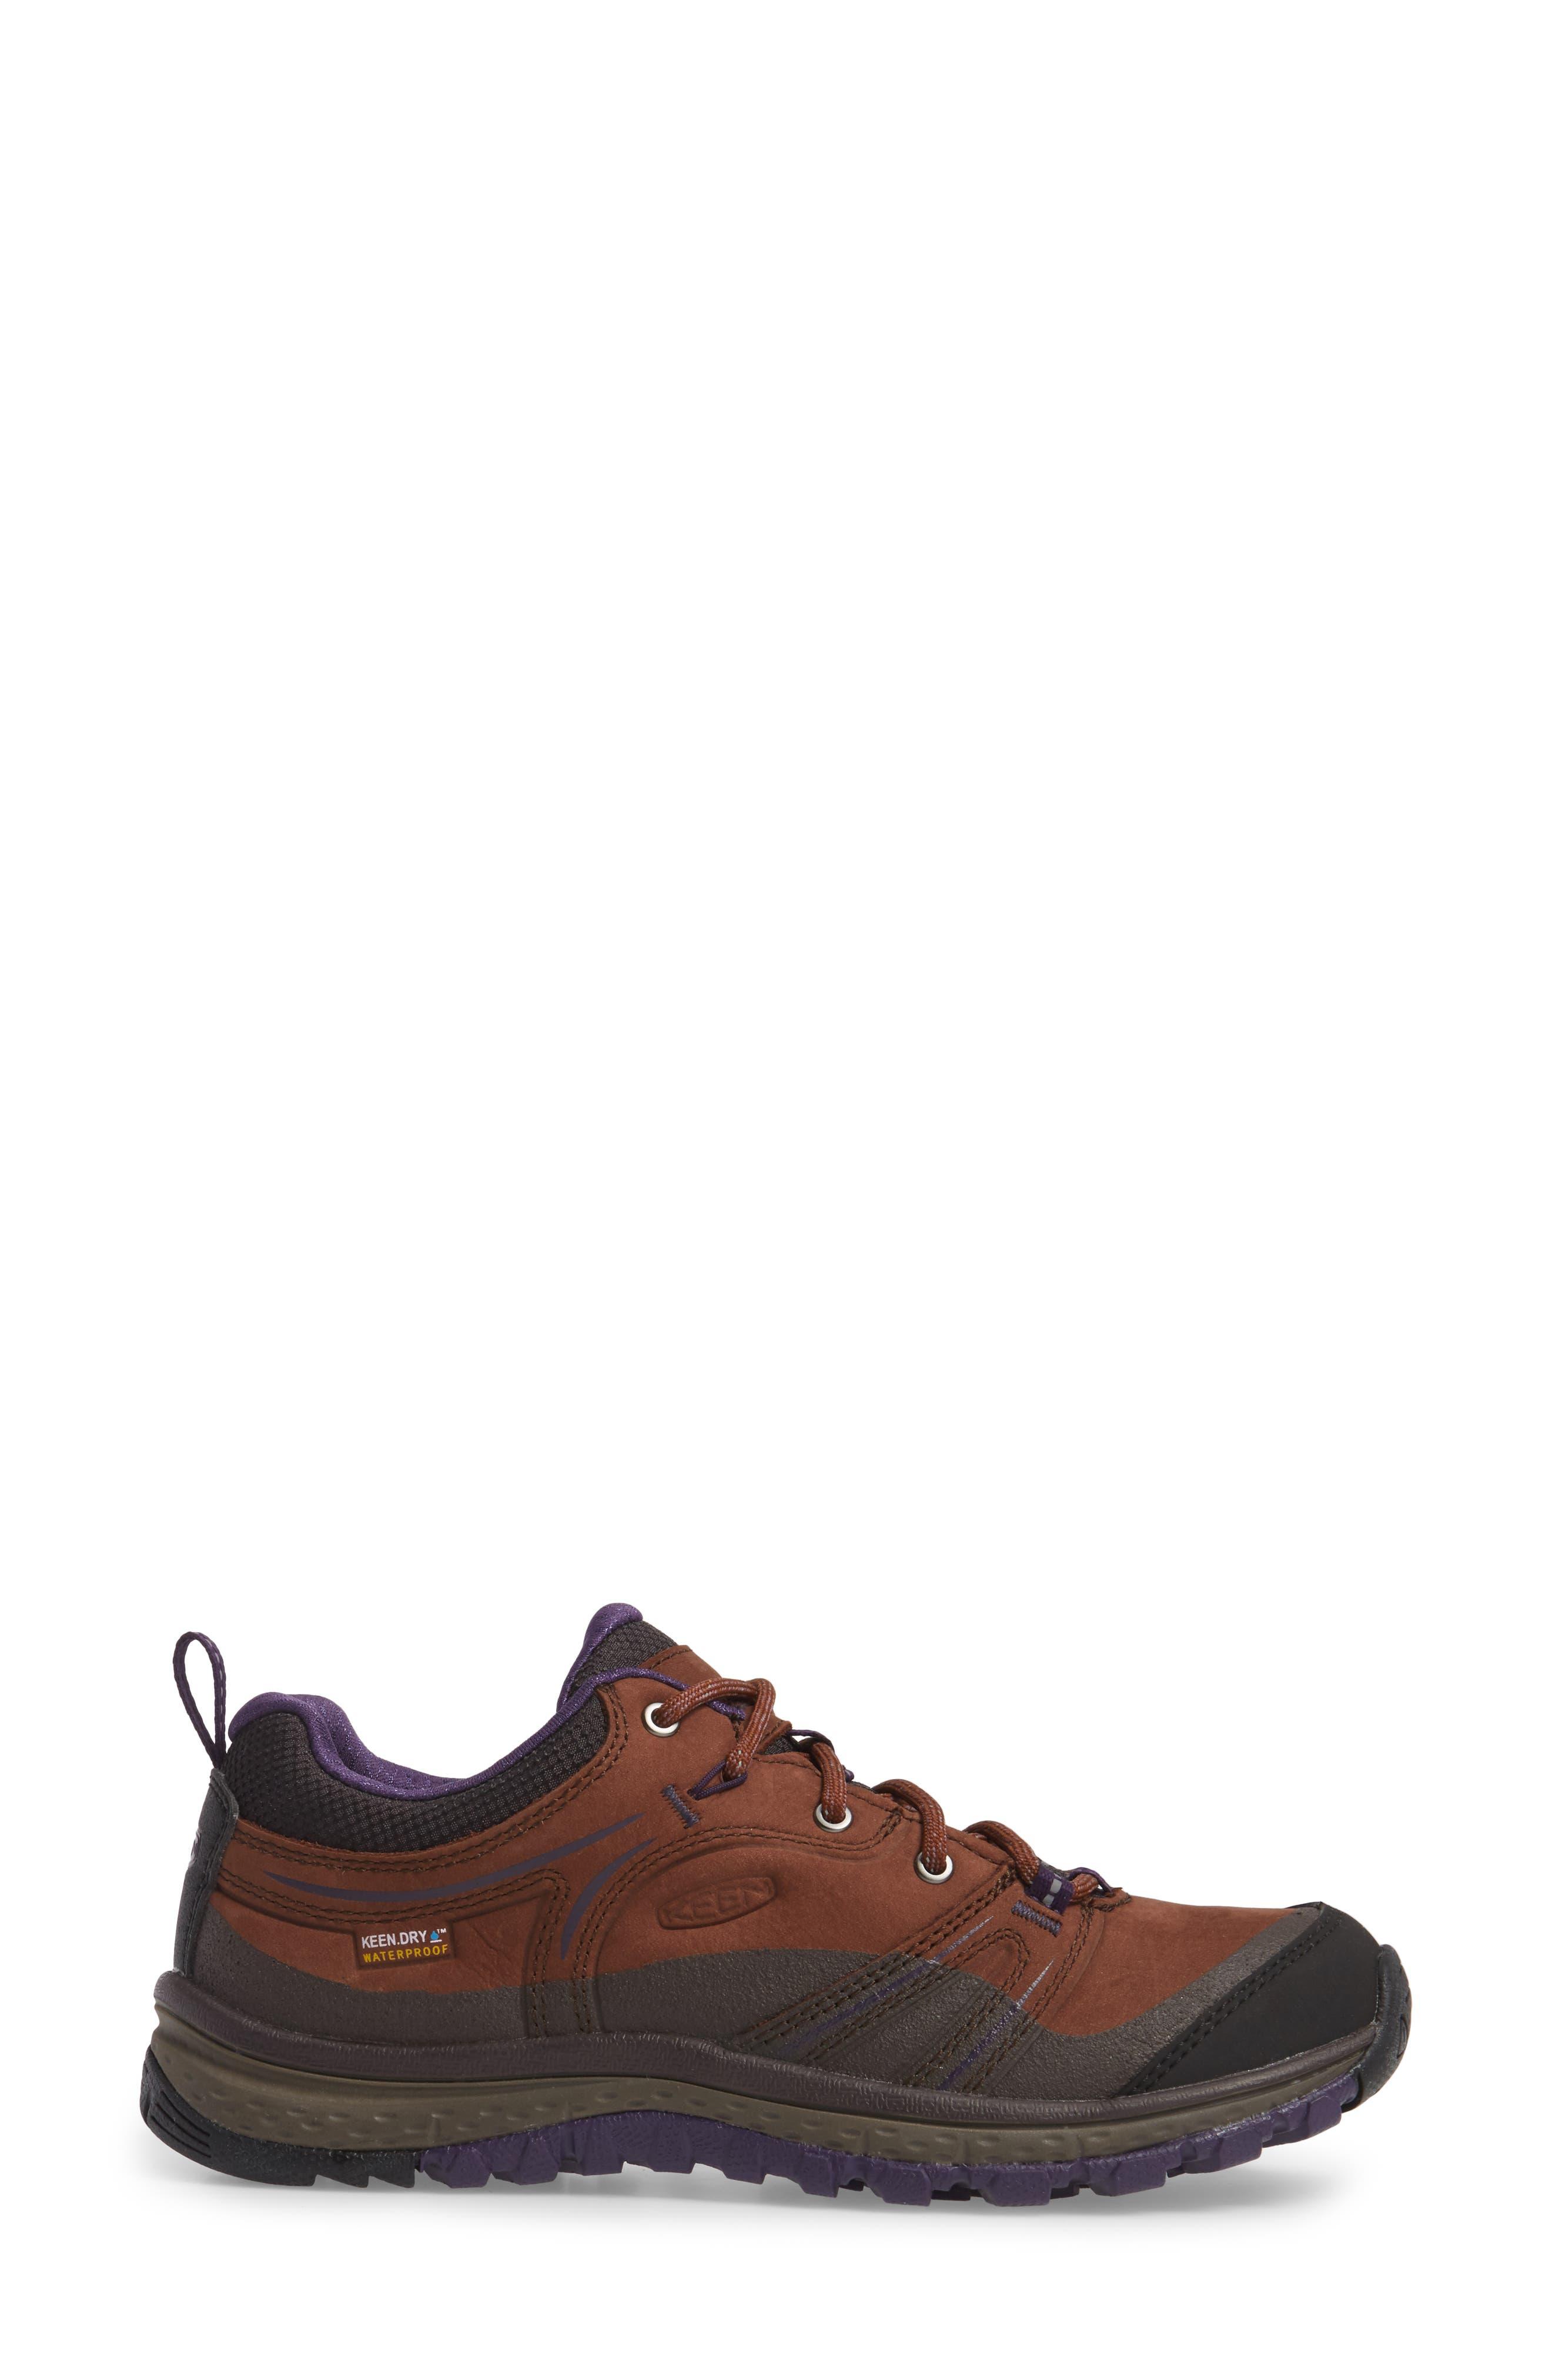 Terradora Waterproof Hiking Shoe,                             Alternate thumbnail 9, color,